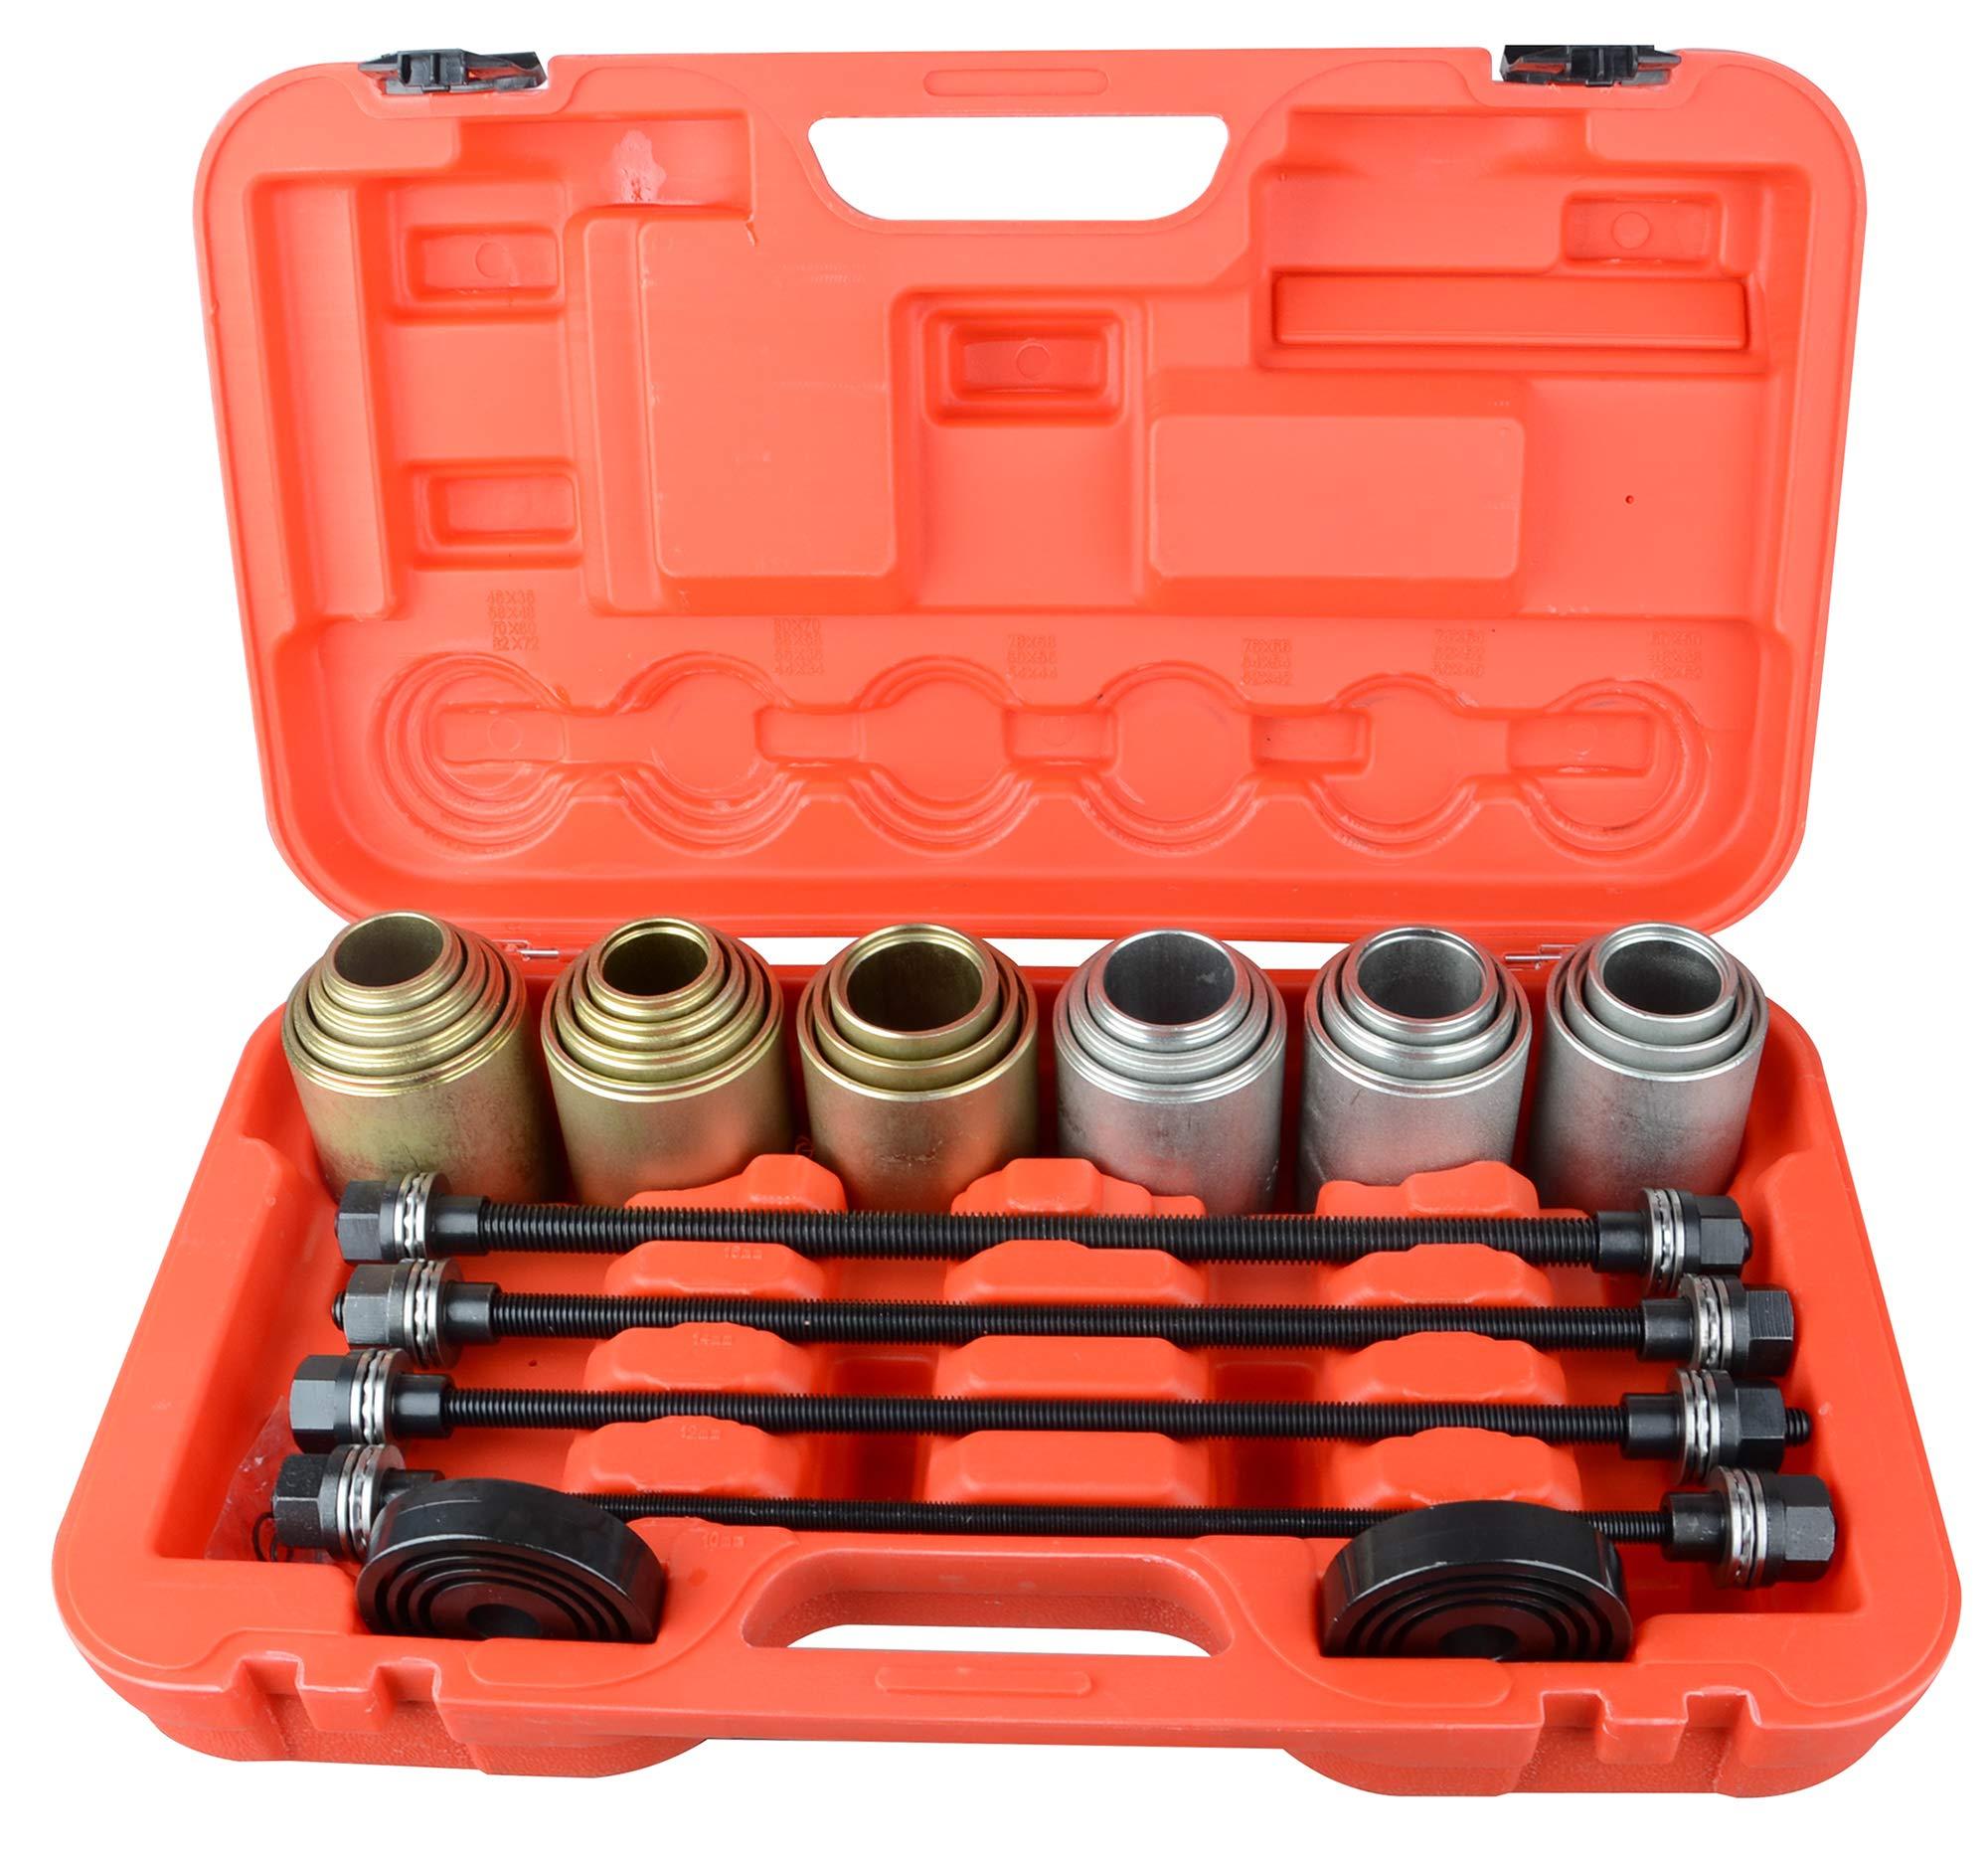 DA YUAN Universal Press and Pull Sleeve Remove Install Bushes Bearings Garage Tool Kit